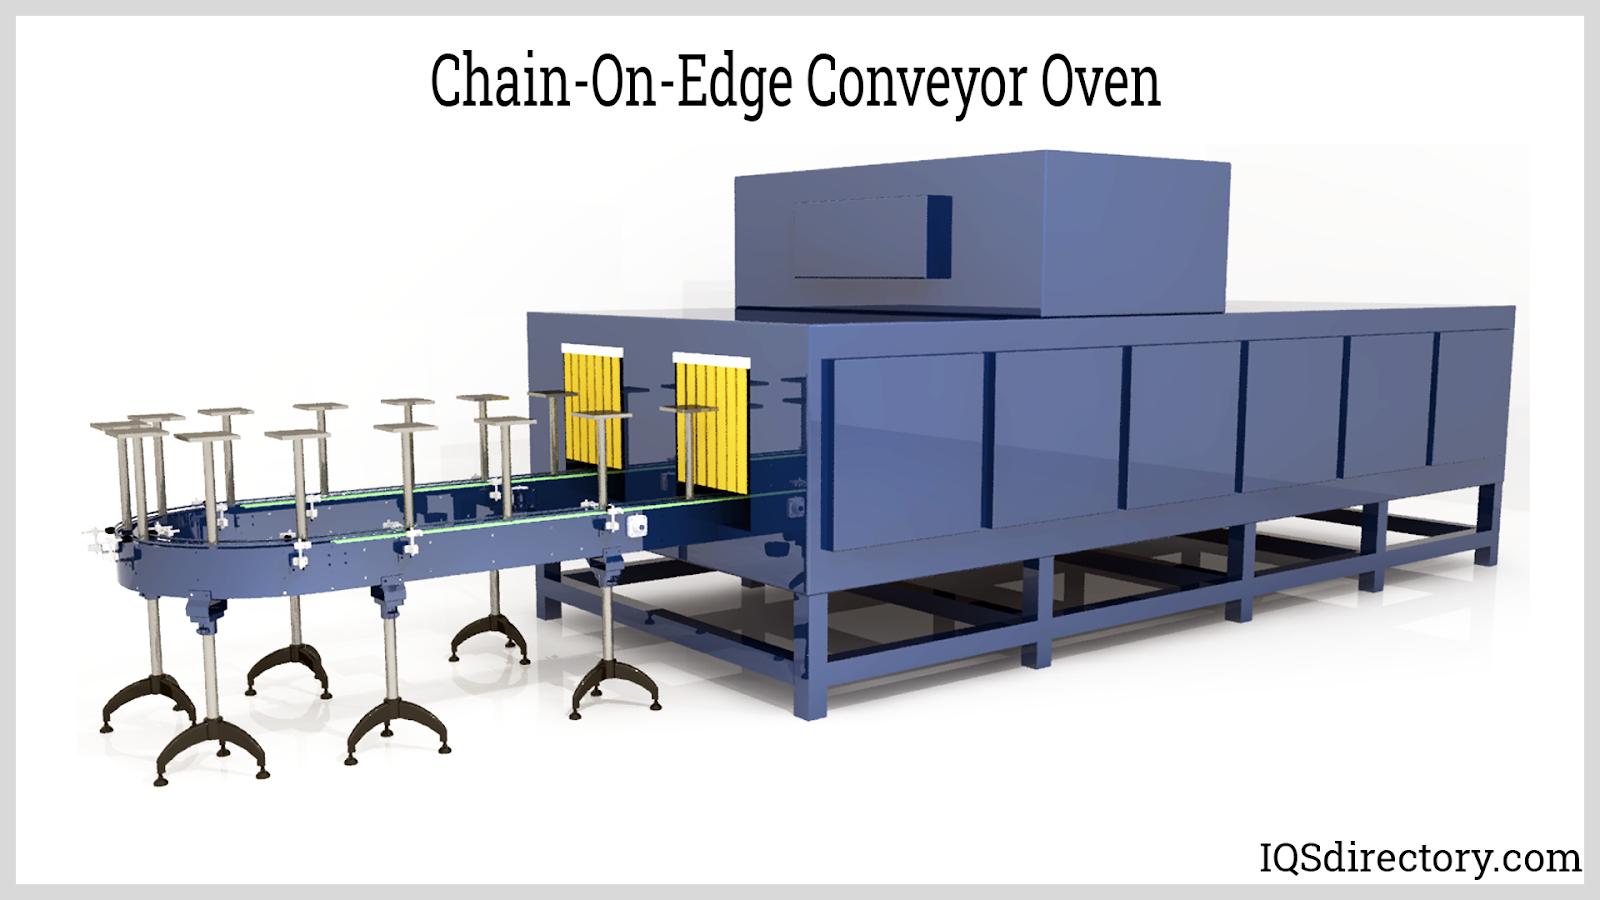 Chain-On-Edge Conveyor Oven